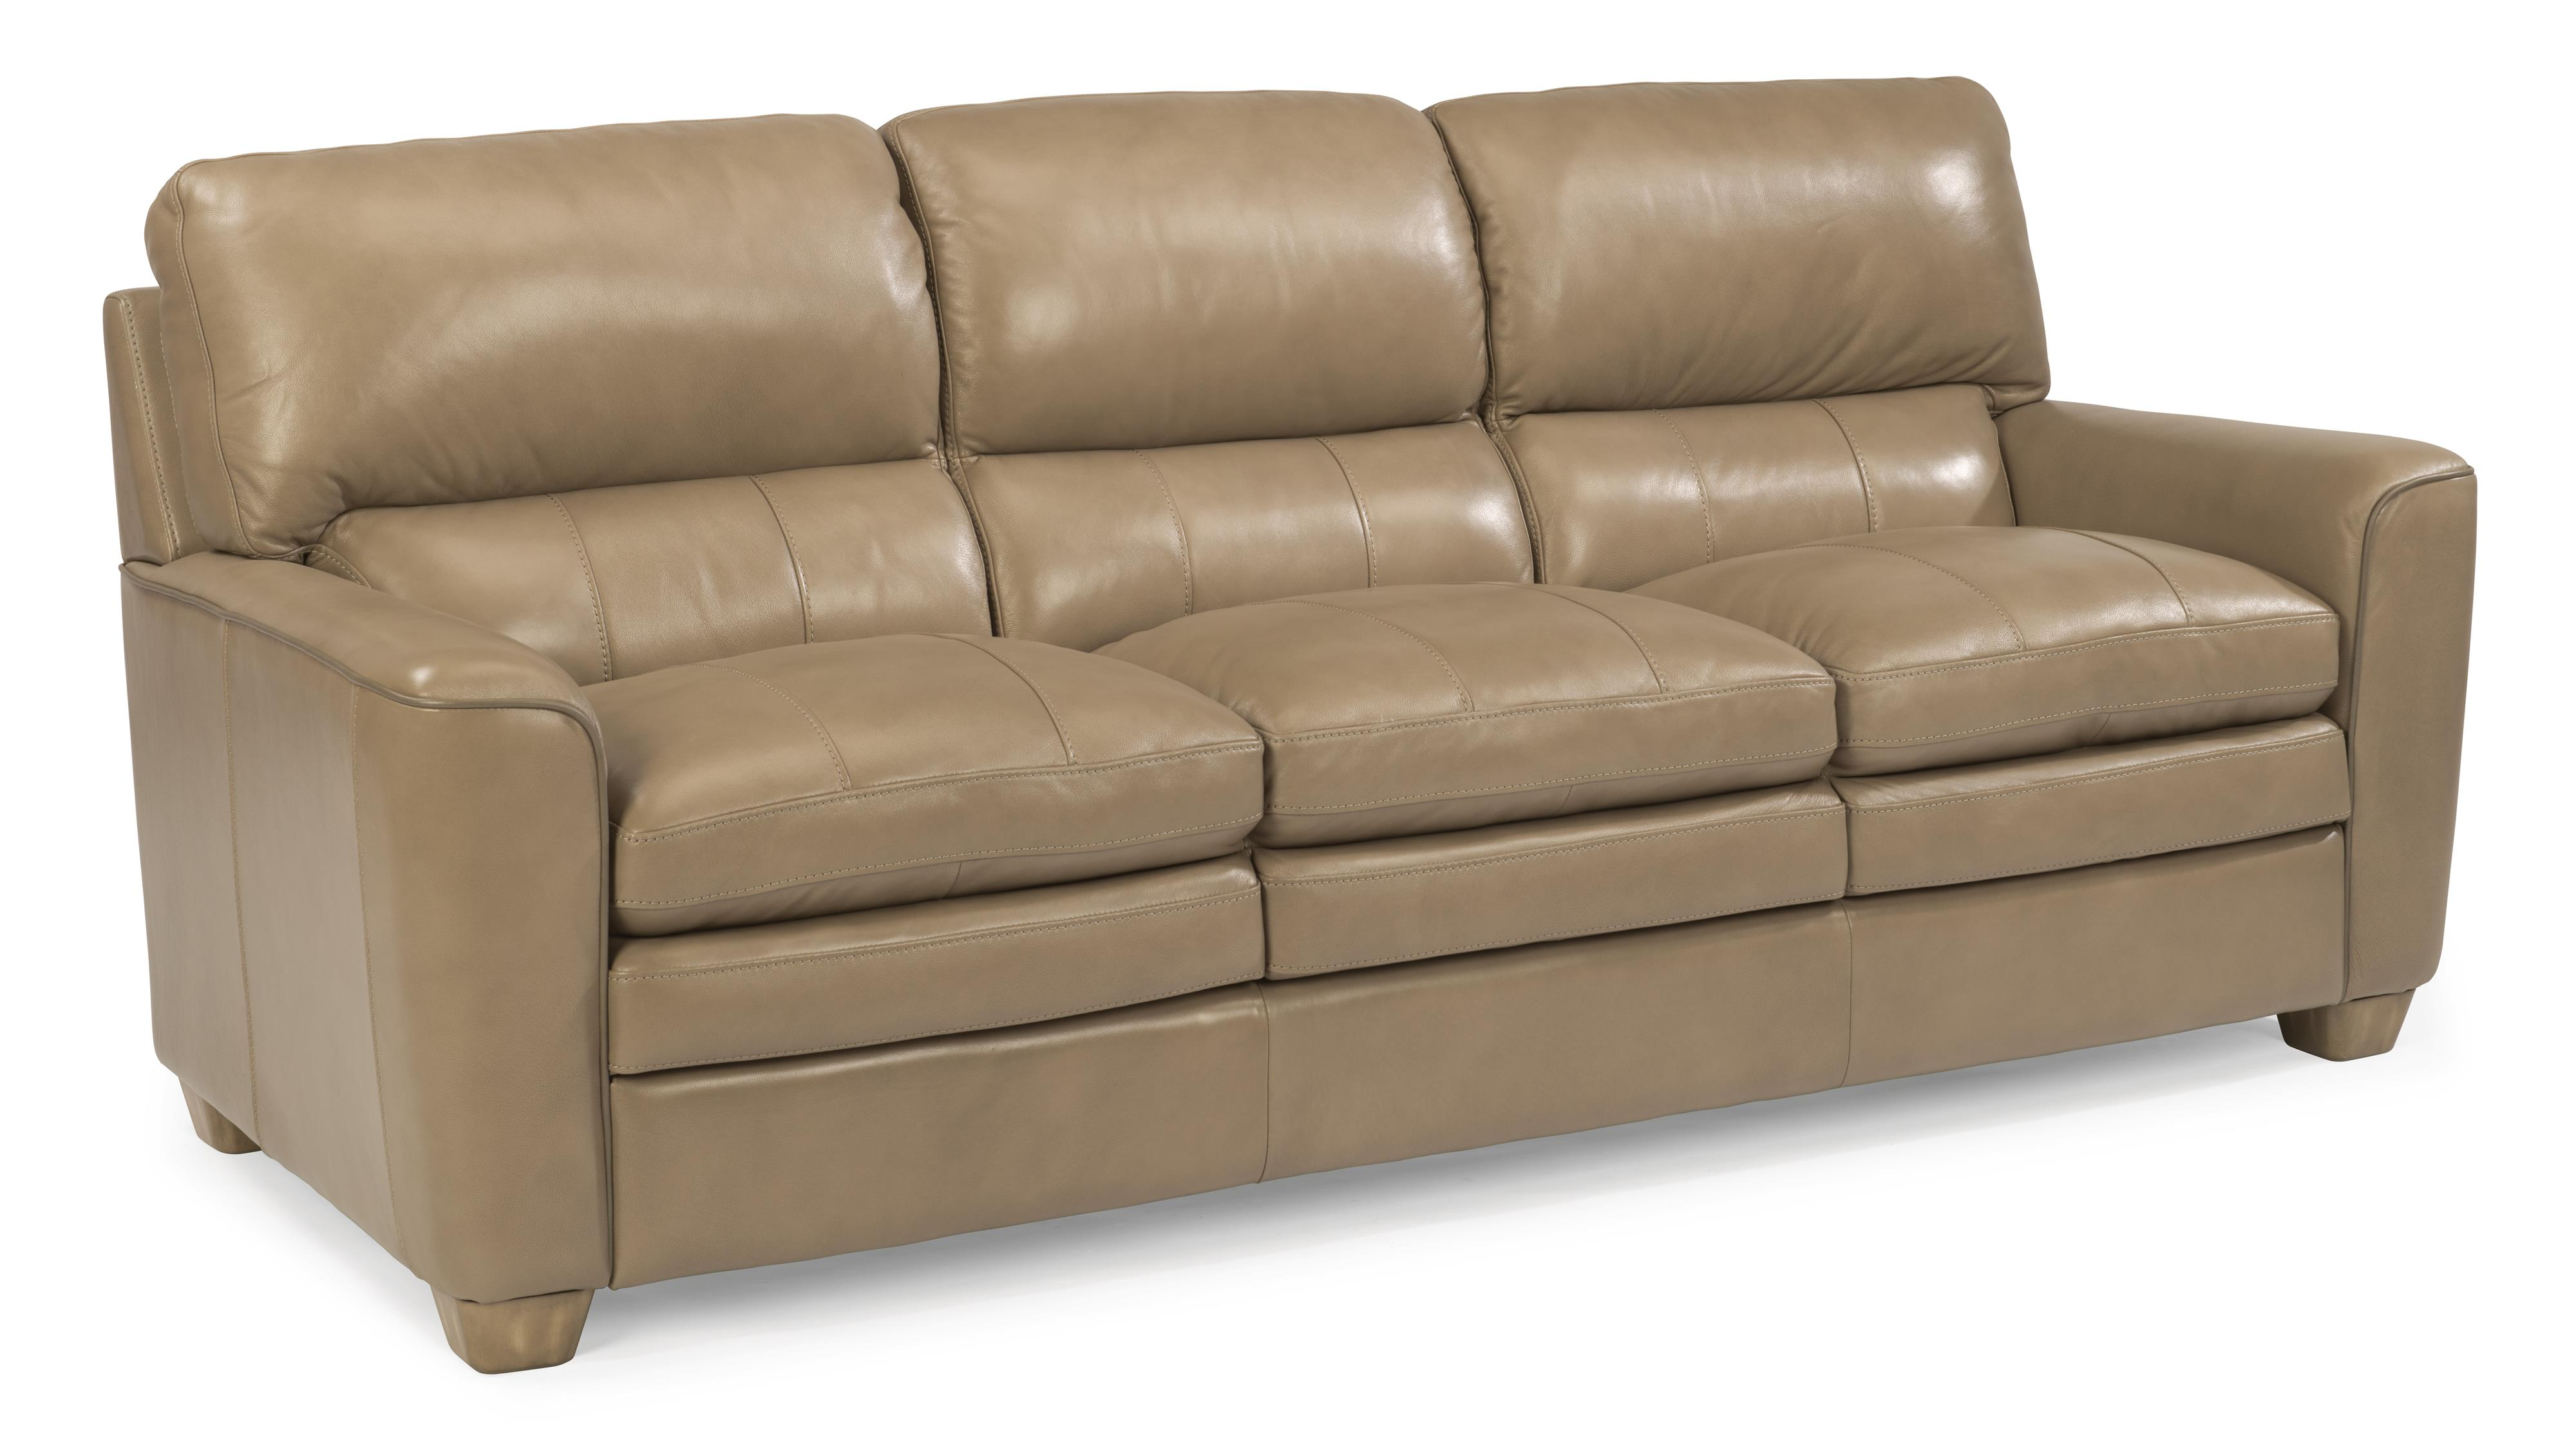 Flexsteel Latitudes-Ivy Sofa - Item Number: 1304-31-739-84